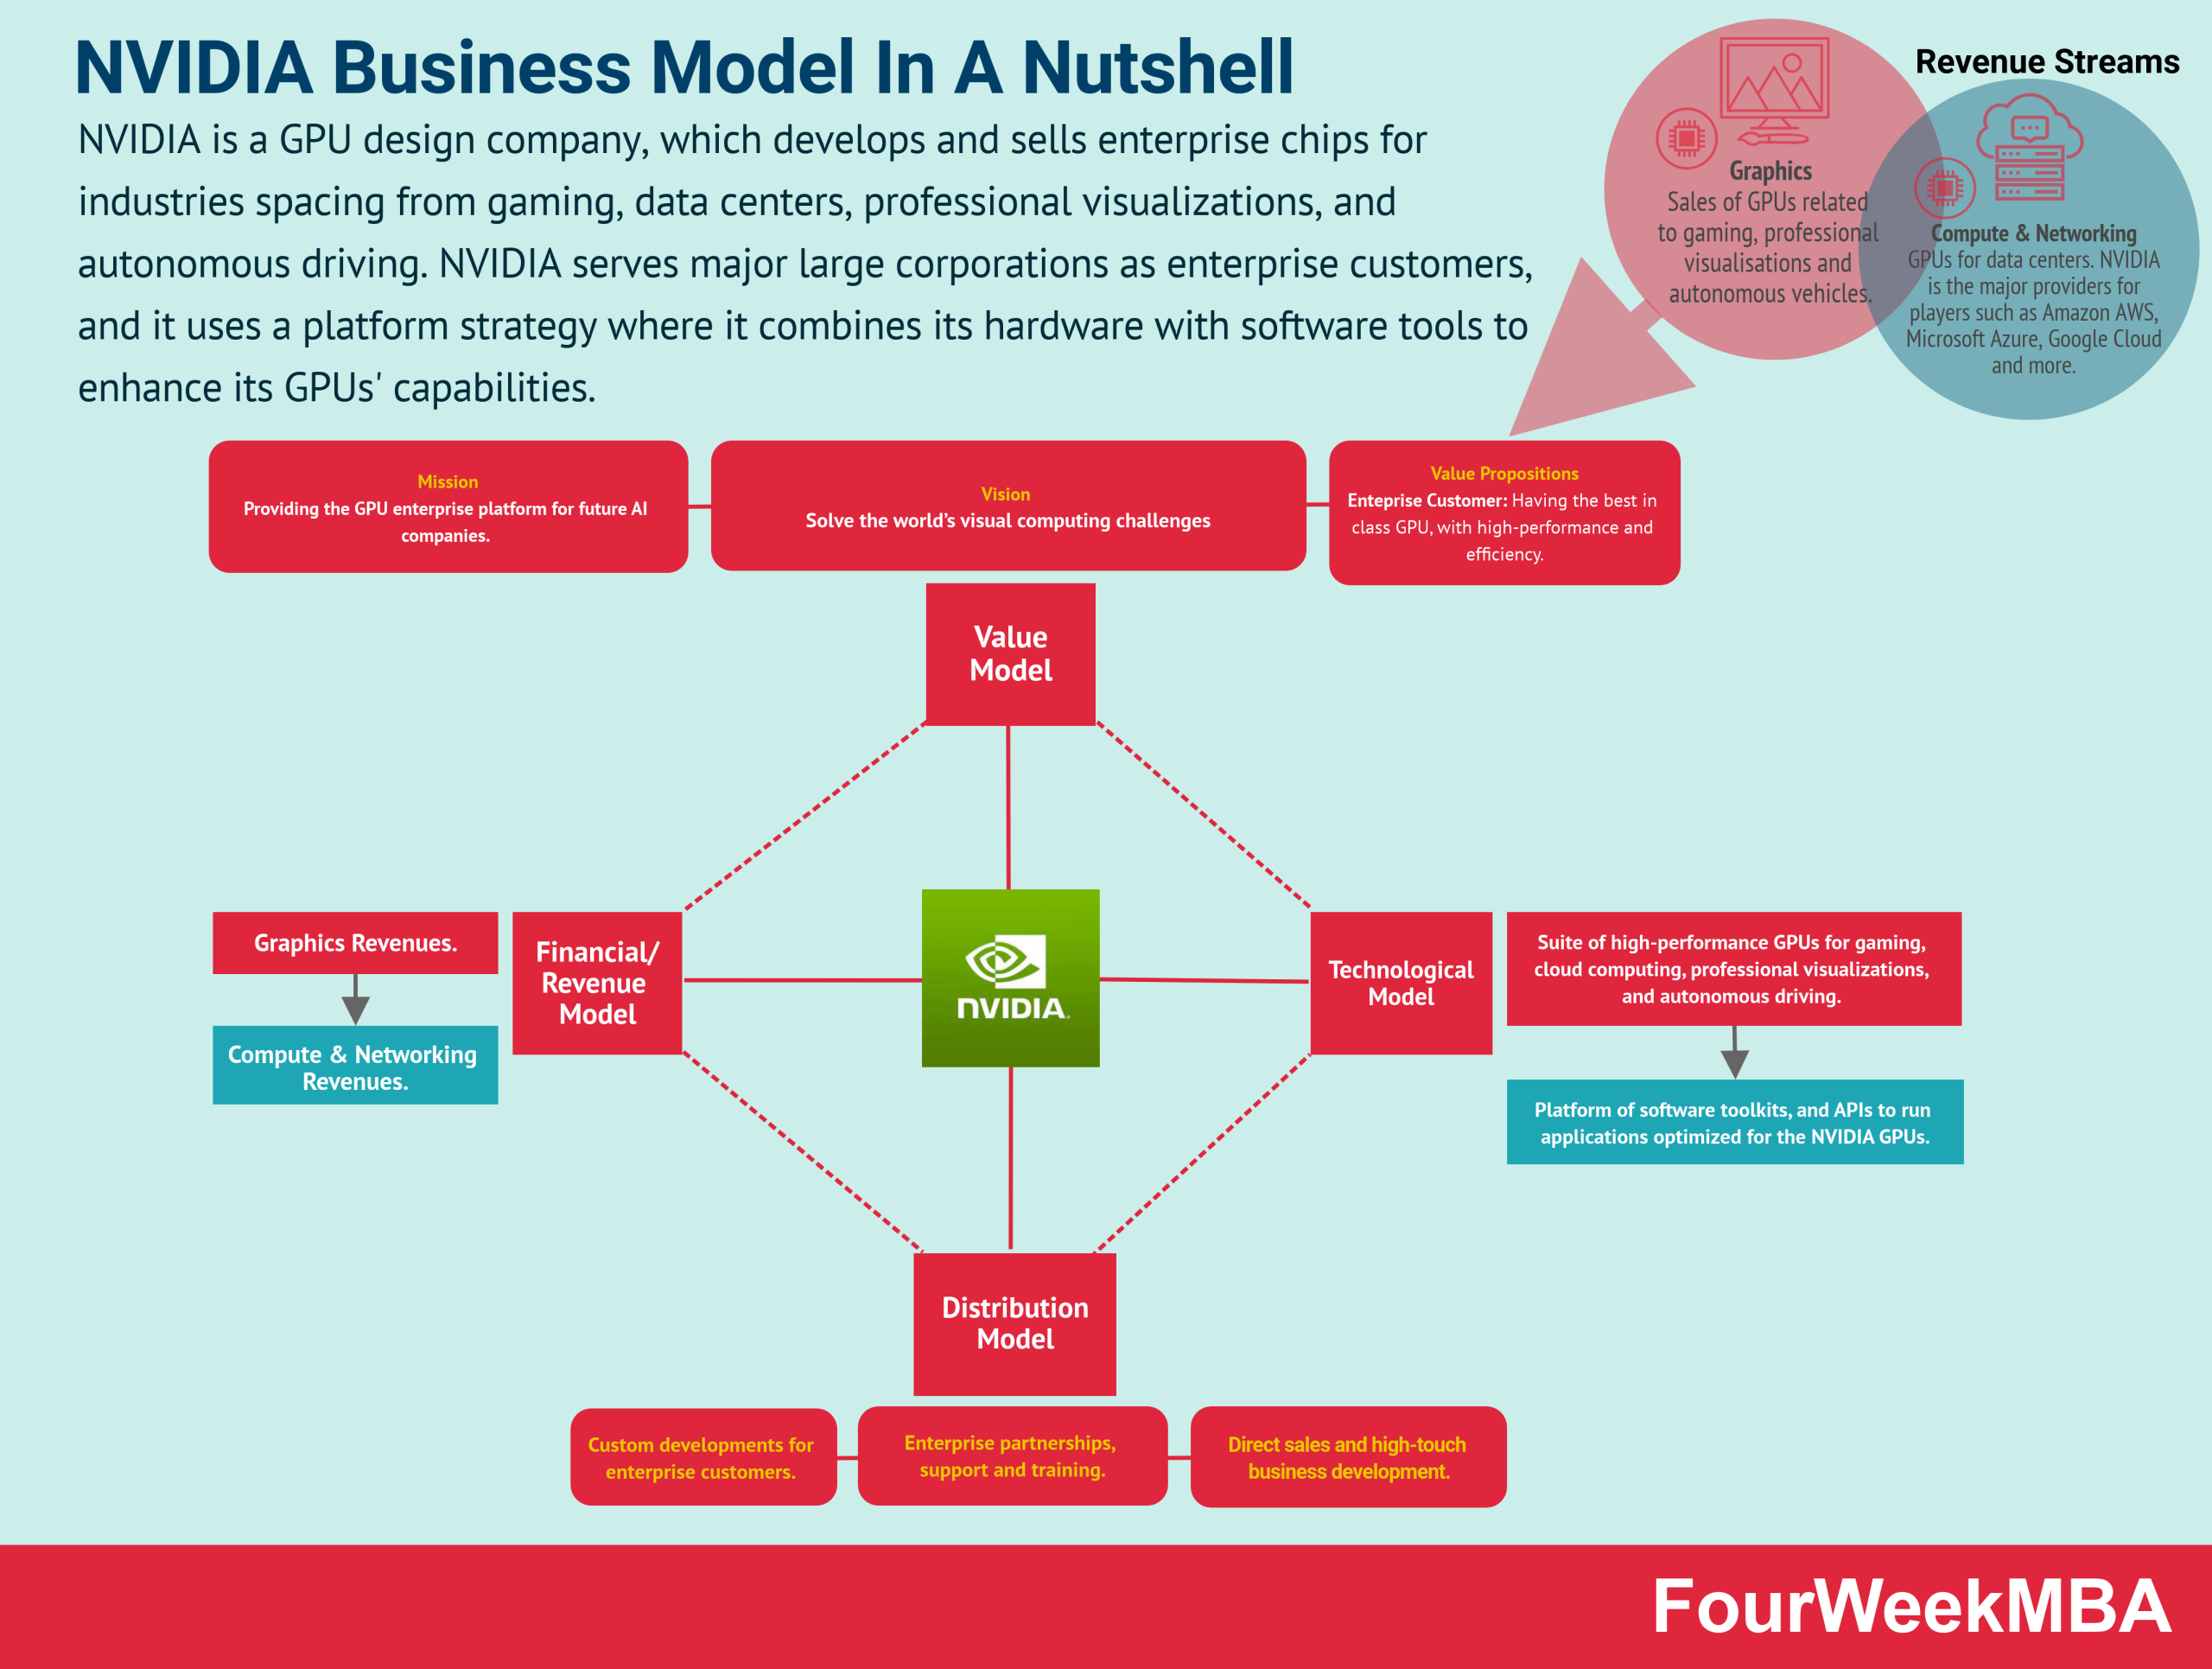 NVIDIA Business Model: The Physical Platform For AI & Autonomous Driving